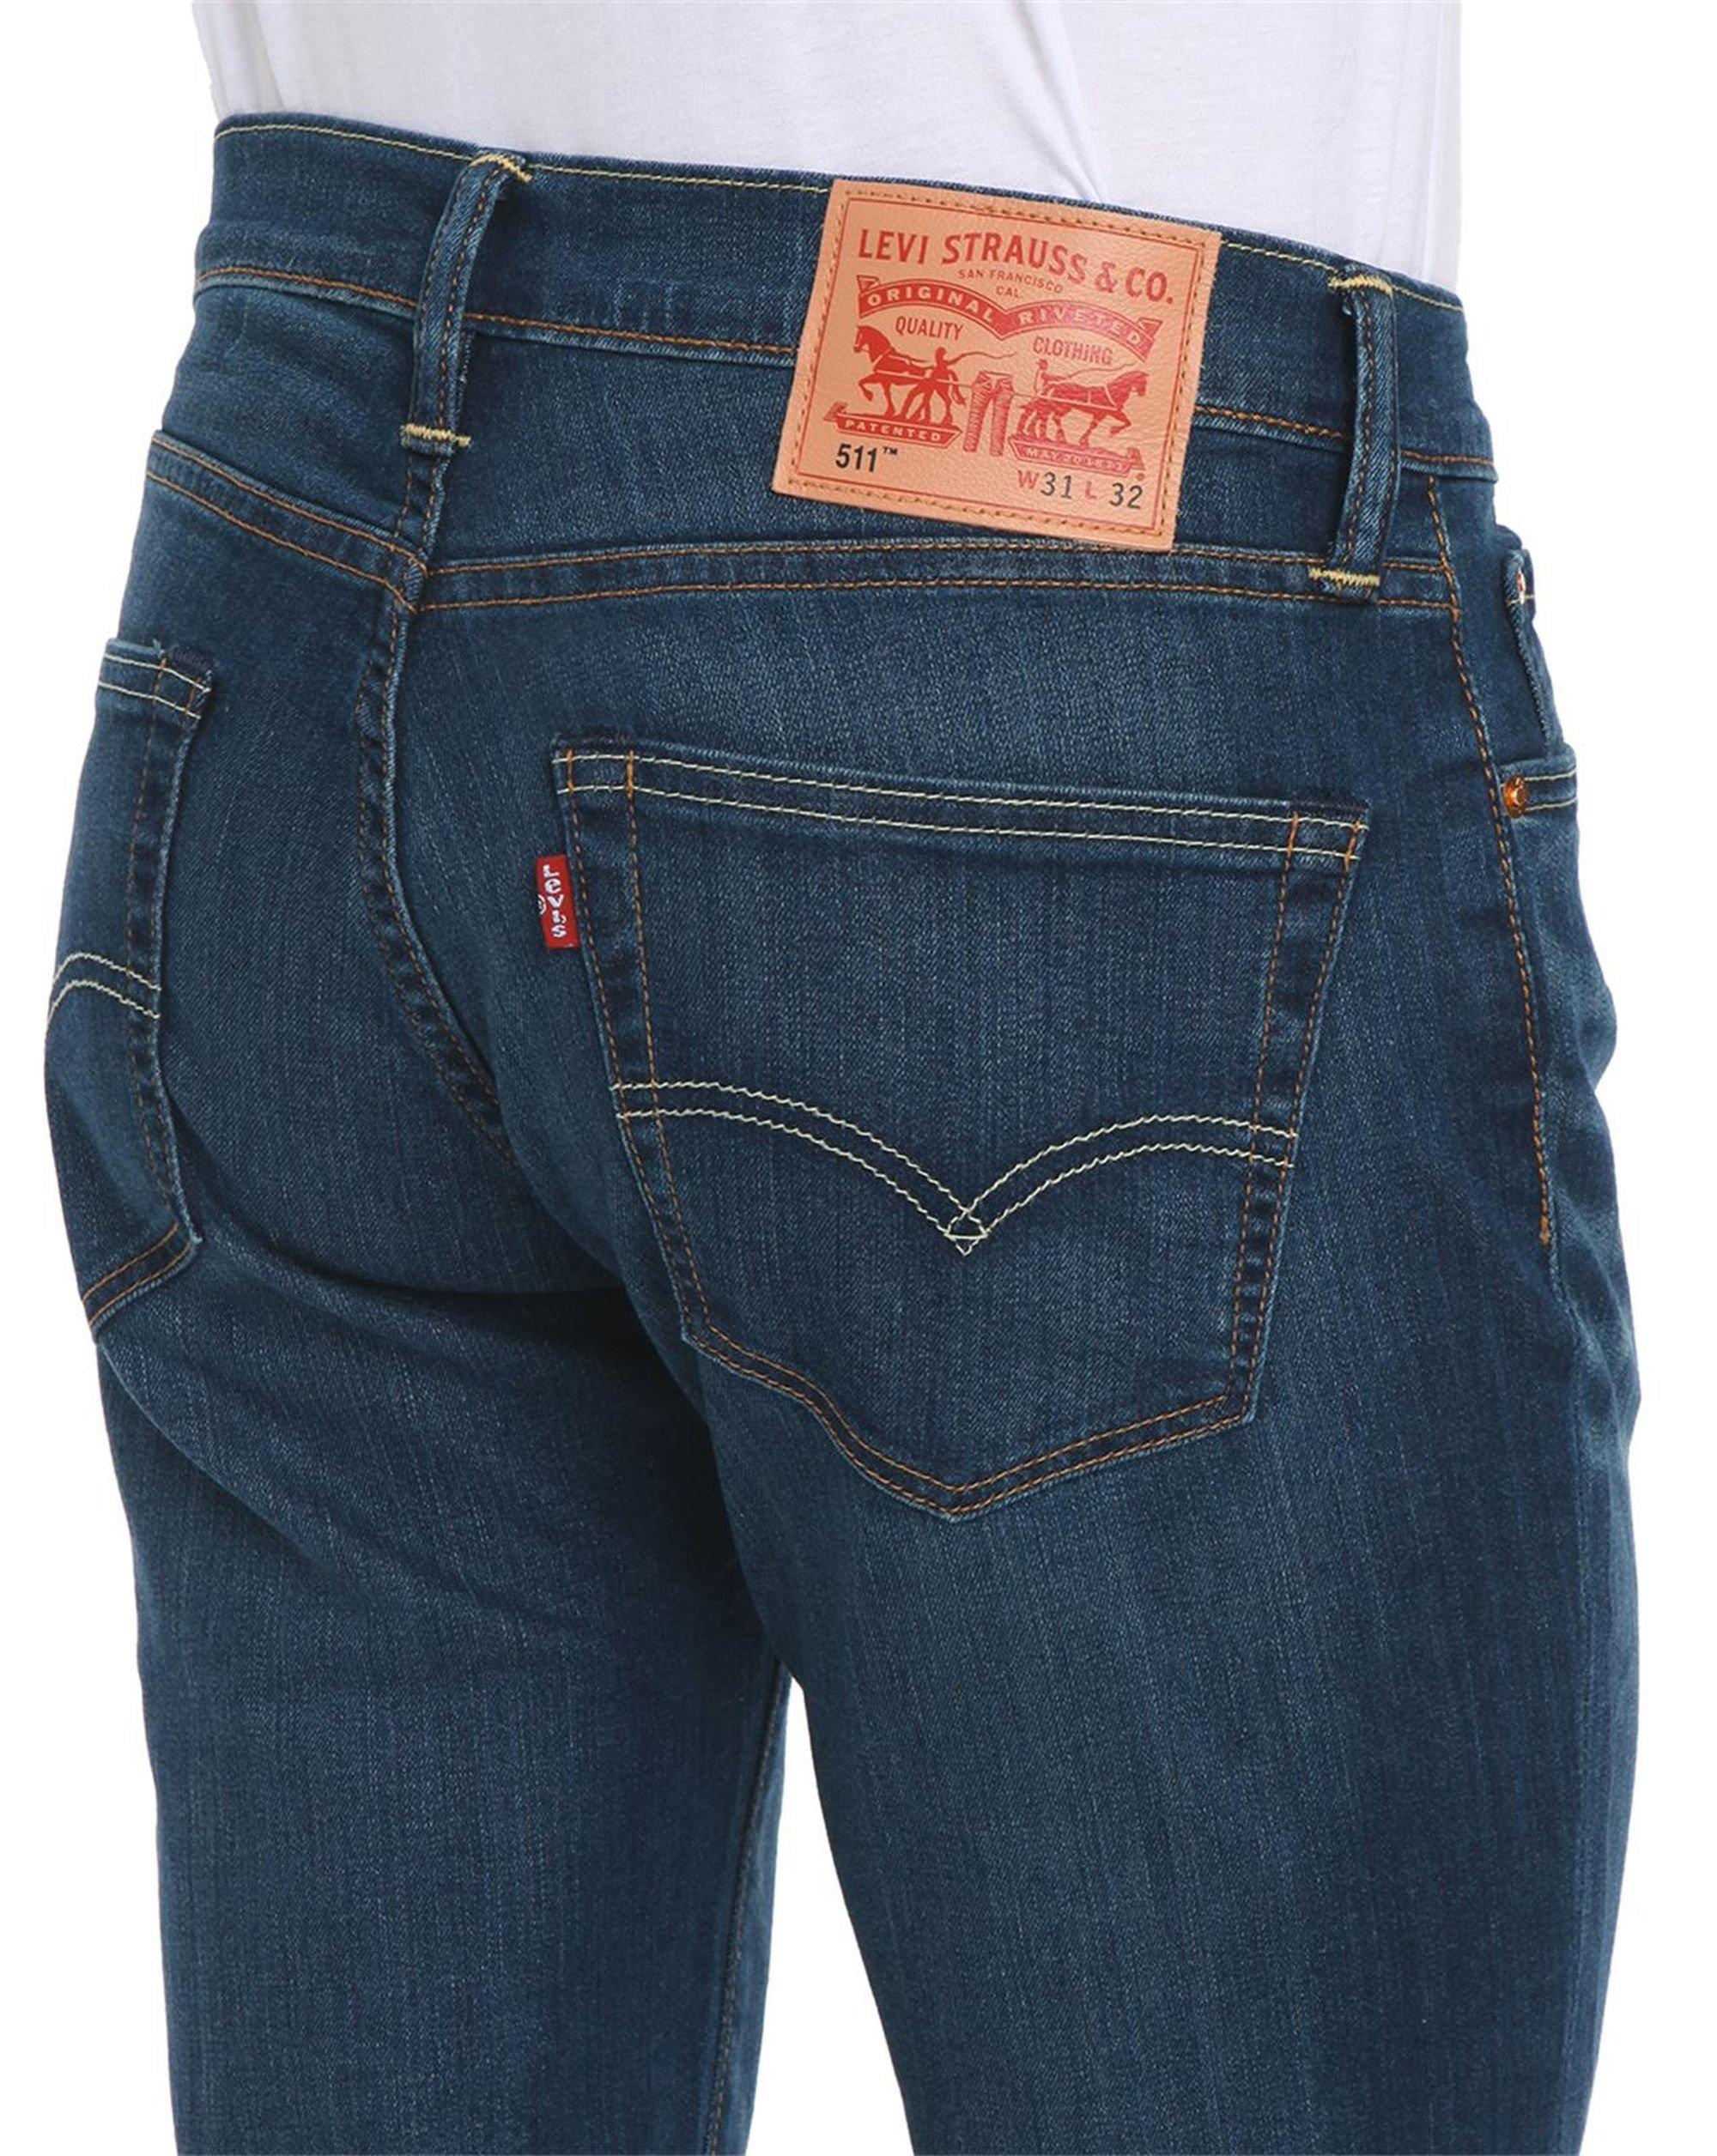 levi 39 s 511 slim fit stone washed jeans in blue for men lyst. Black Bedroom Furniture Sets. Home Design Ideas